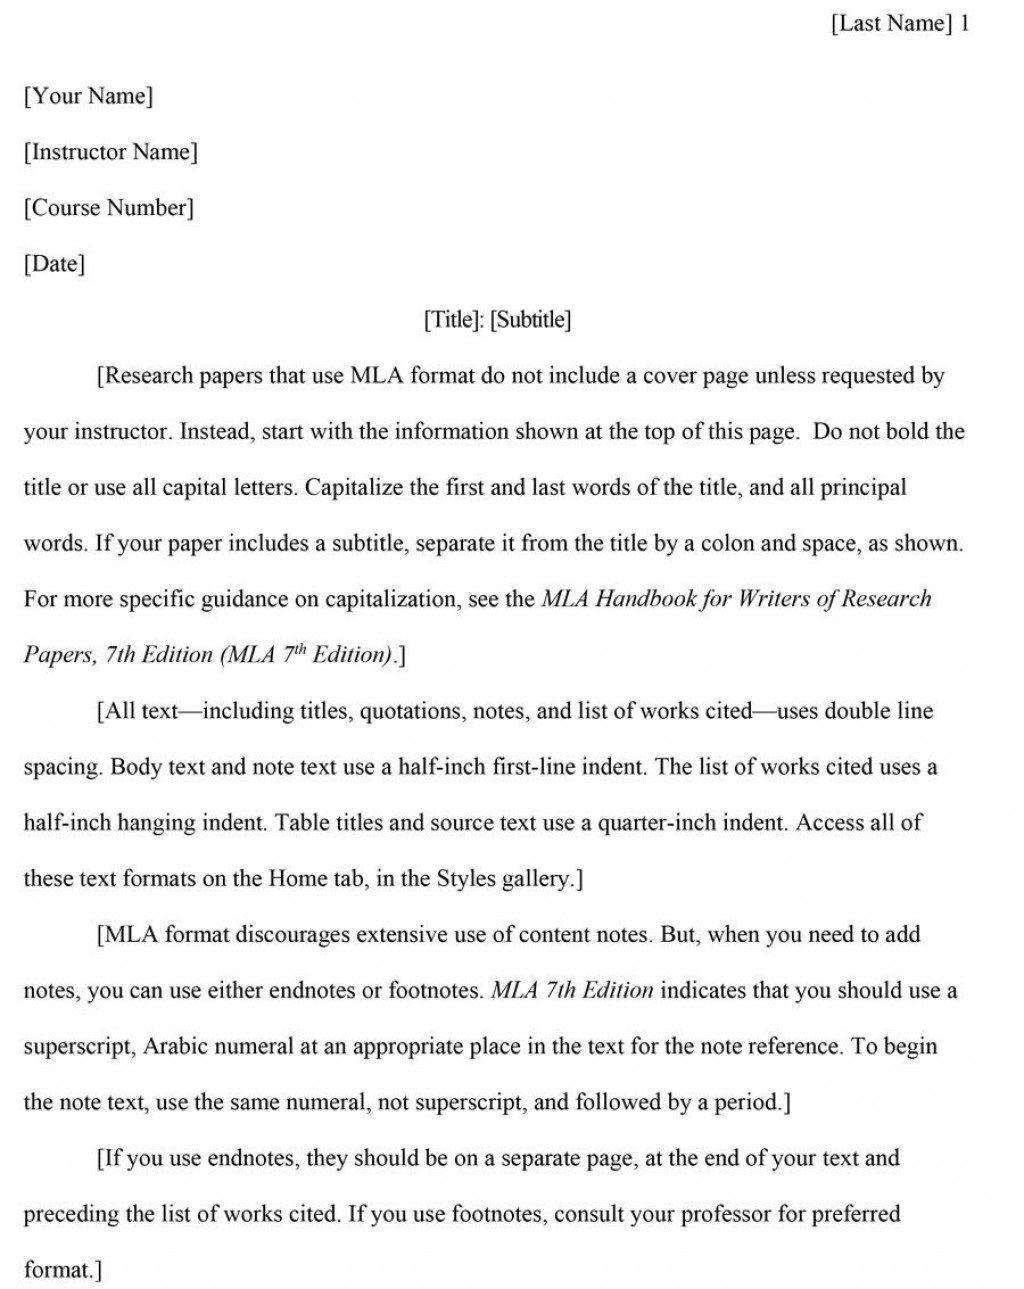 004 Impressive Sample Research Paper Proposal Template Idea  Writing ALarge